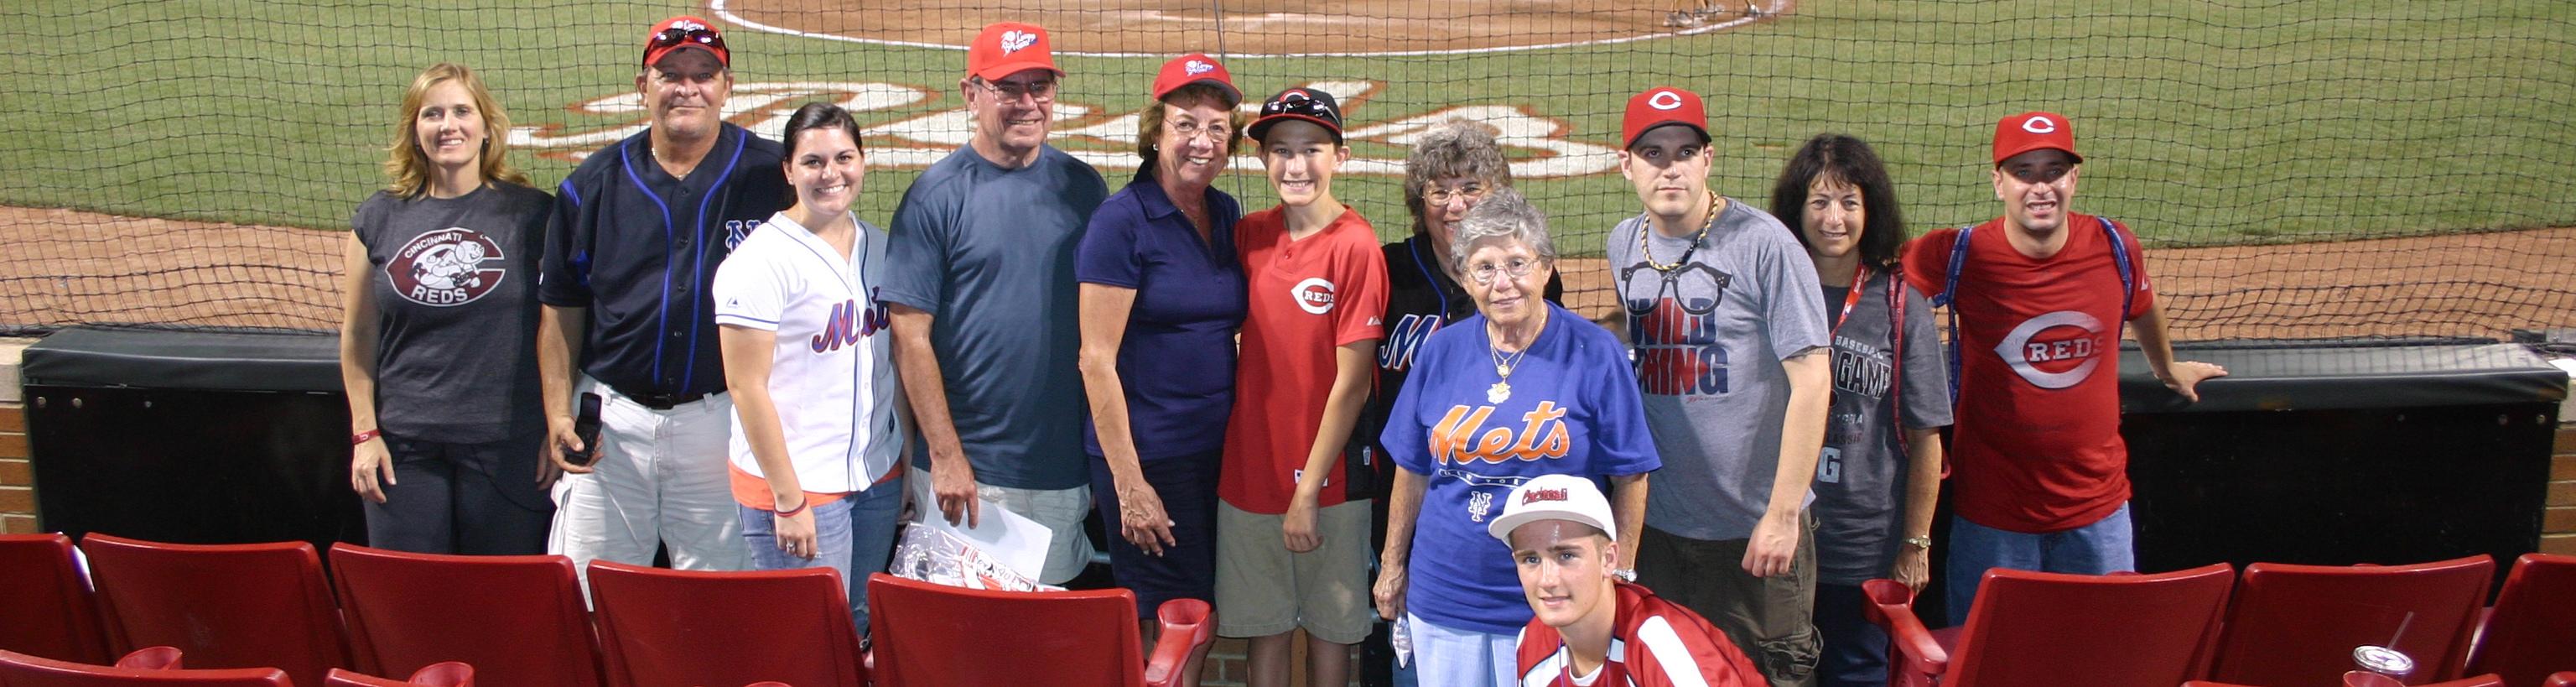 Group baseball tours,baseball vacation packages